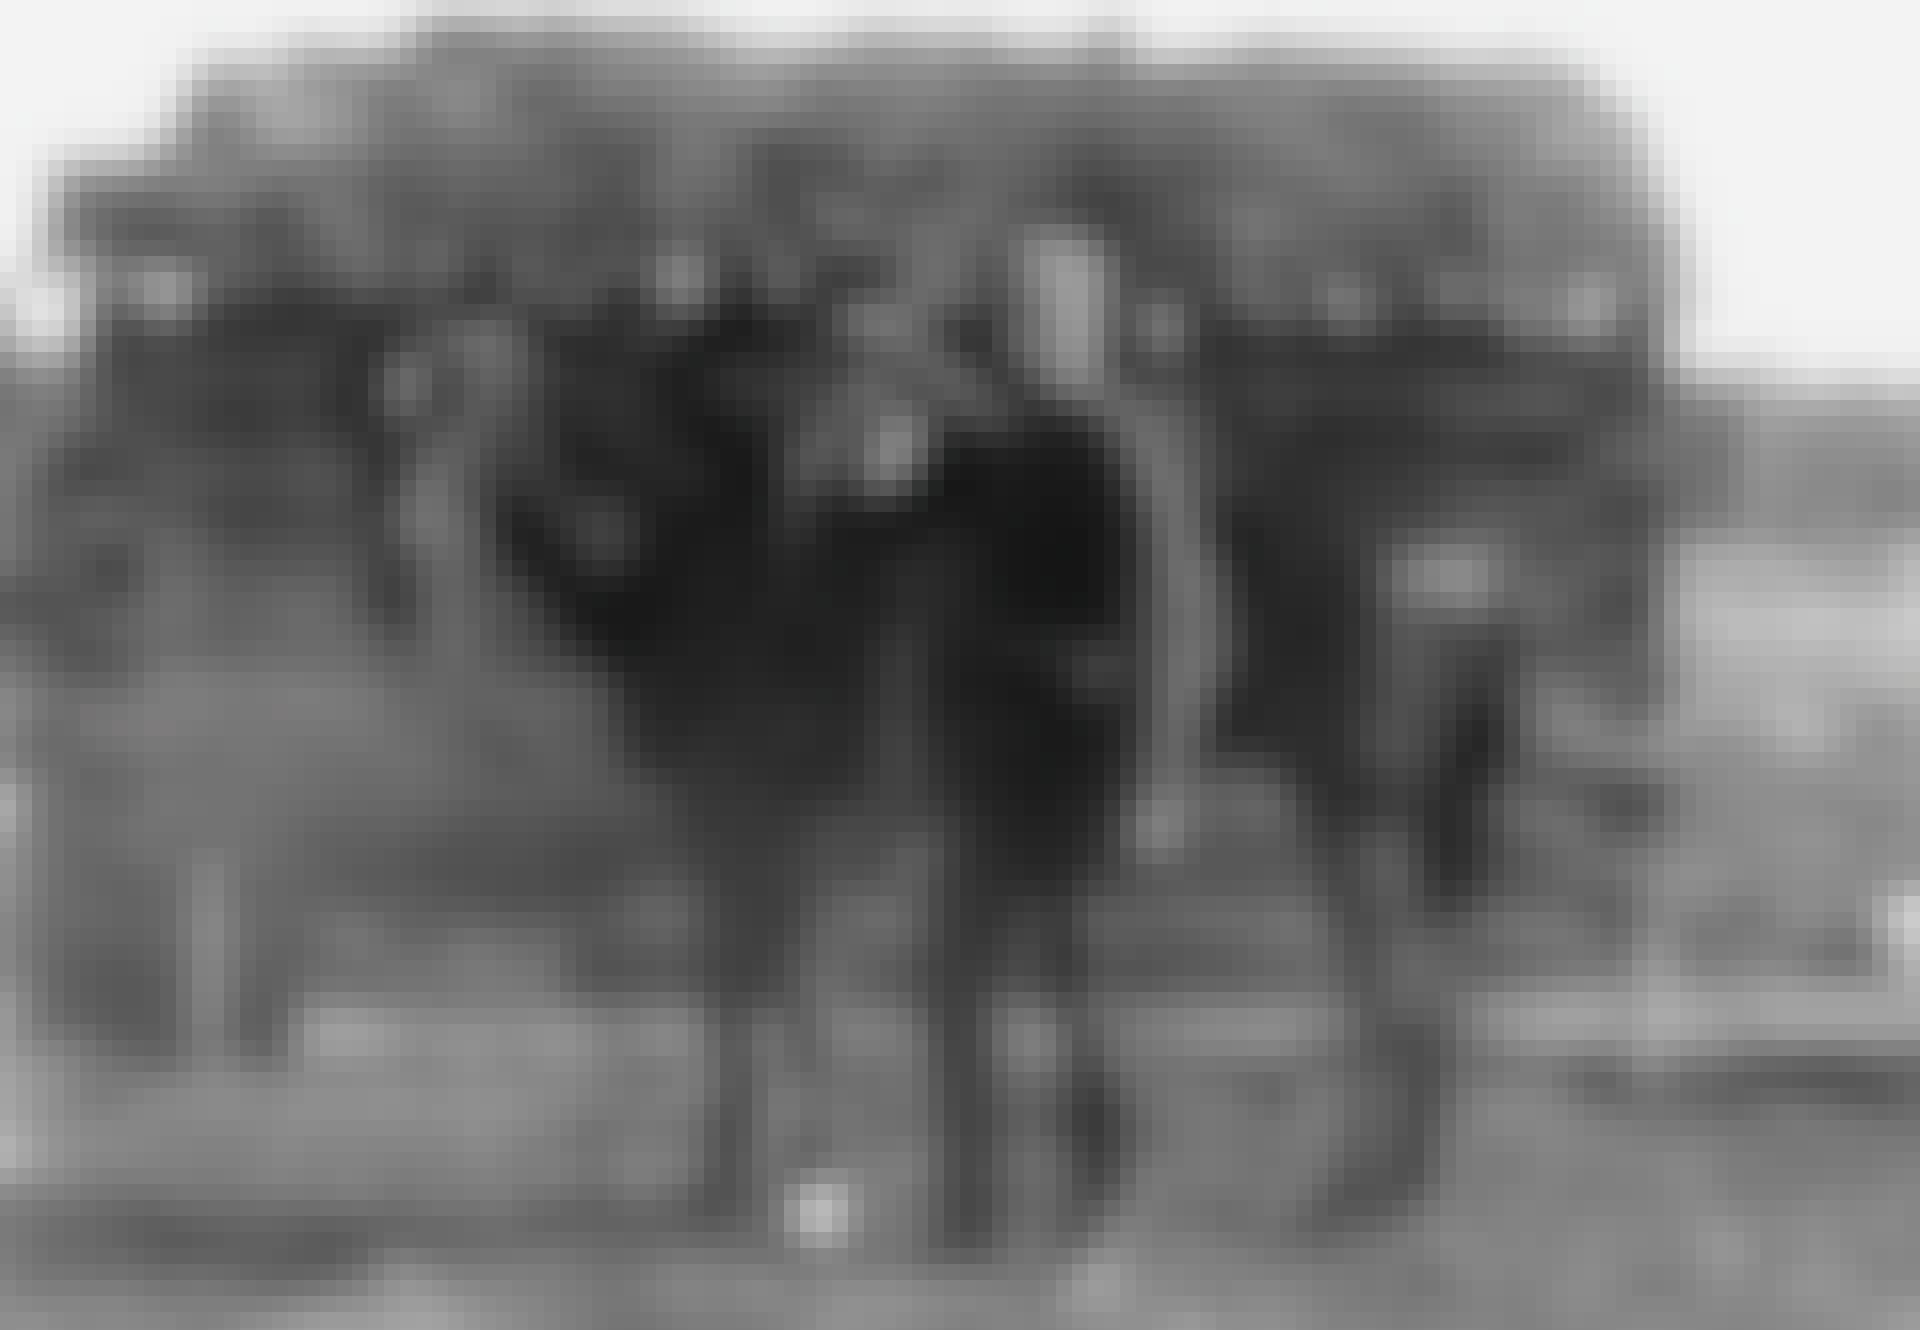 RCMP circa 1900